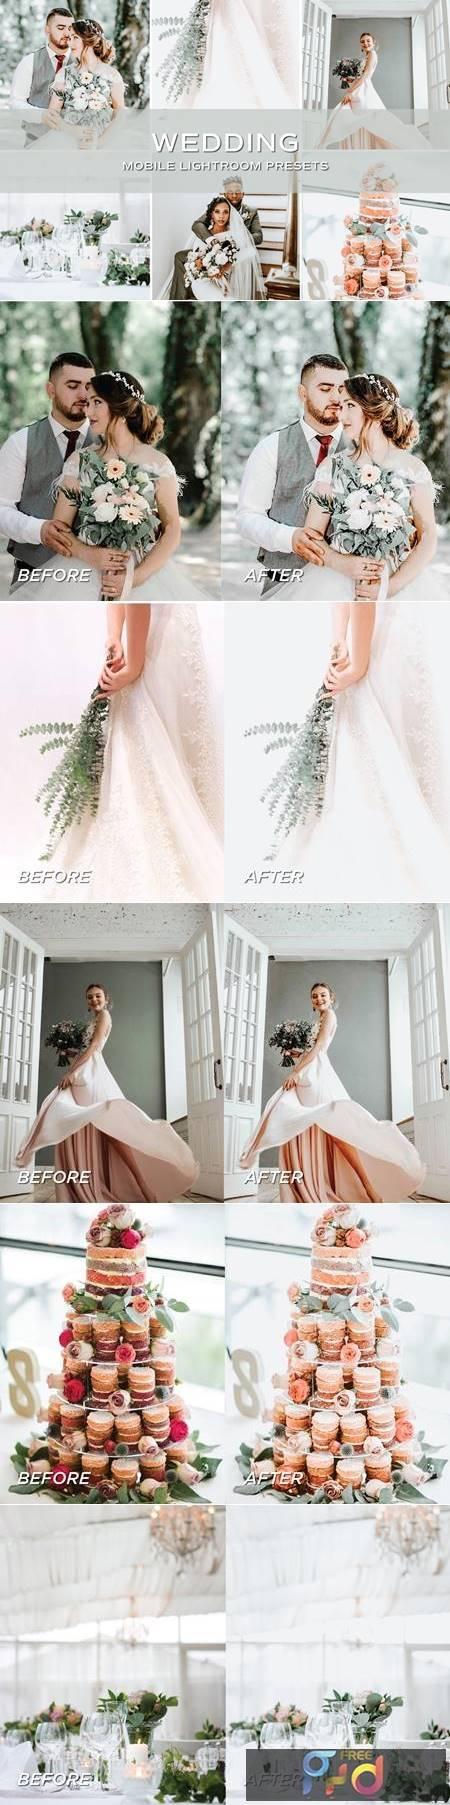 5 Wedding Lightroom Presets 5701752 1